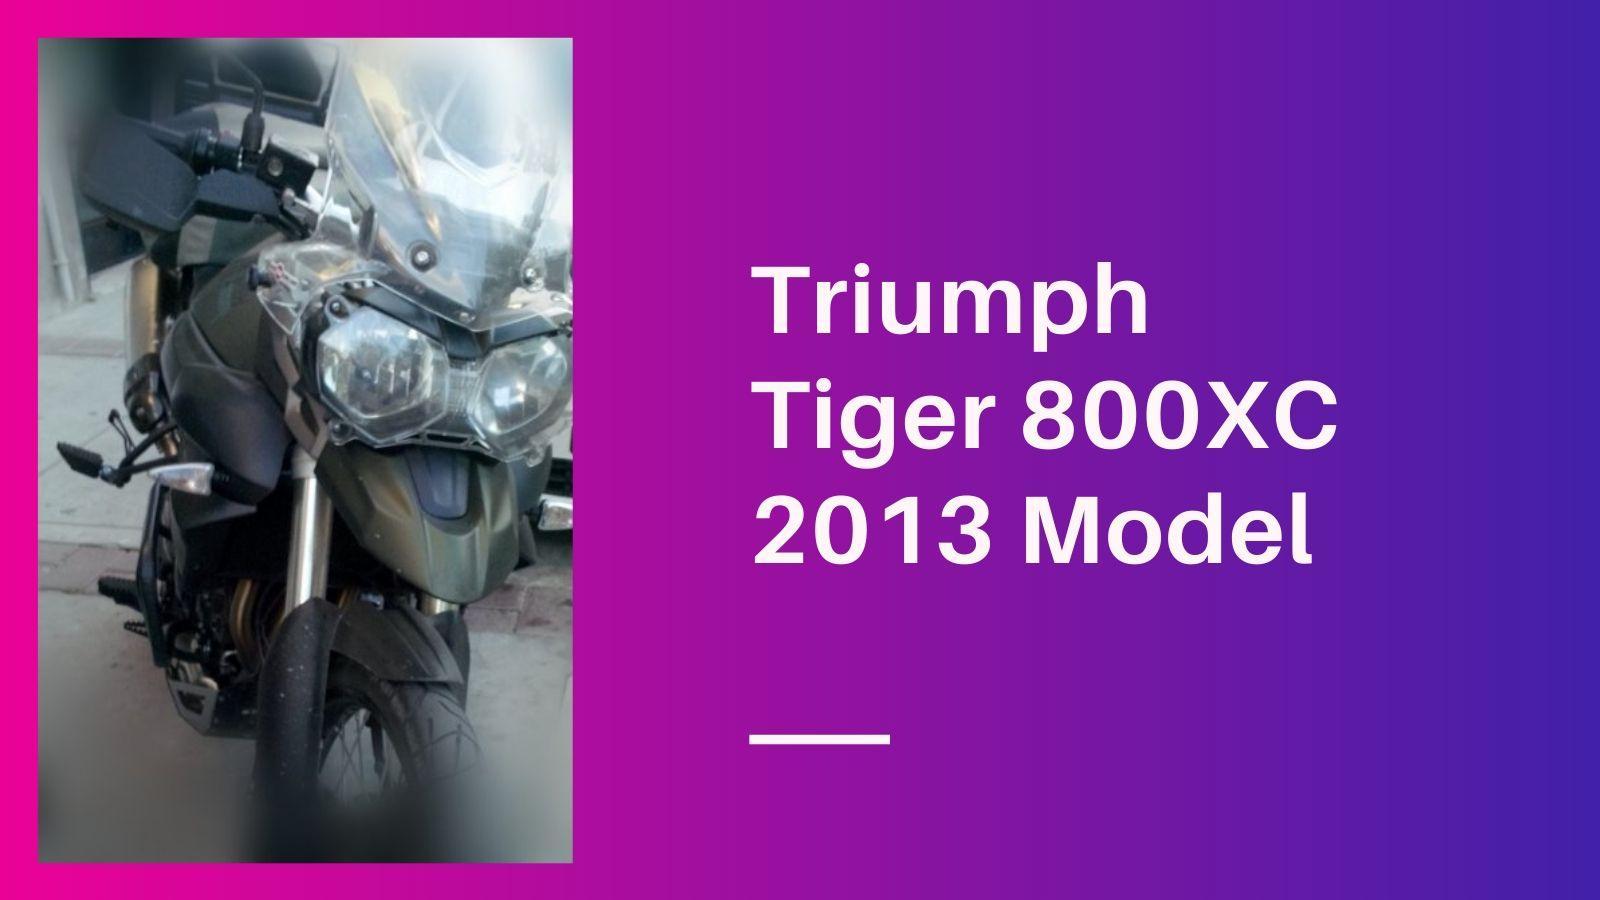 Triumph Tiger 800XC 2013 Model tenıtım değerlendirme